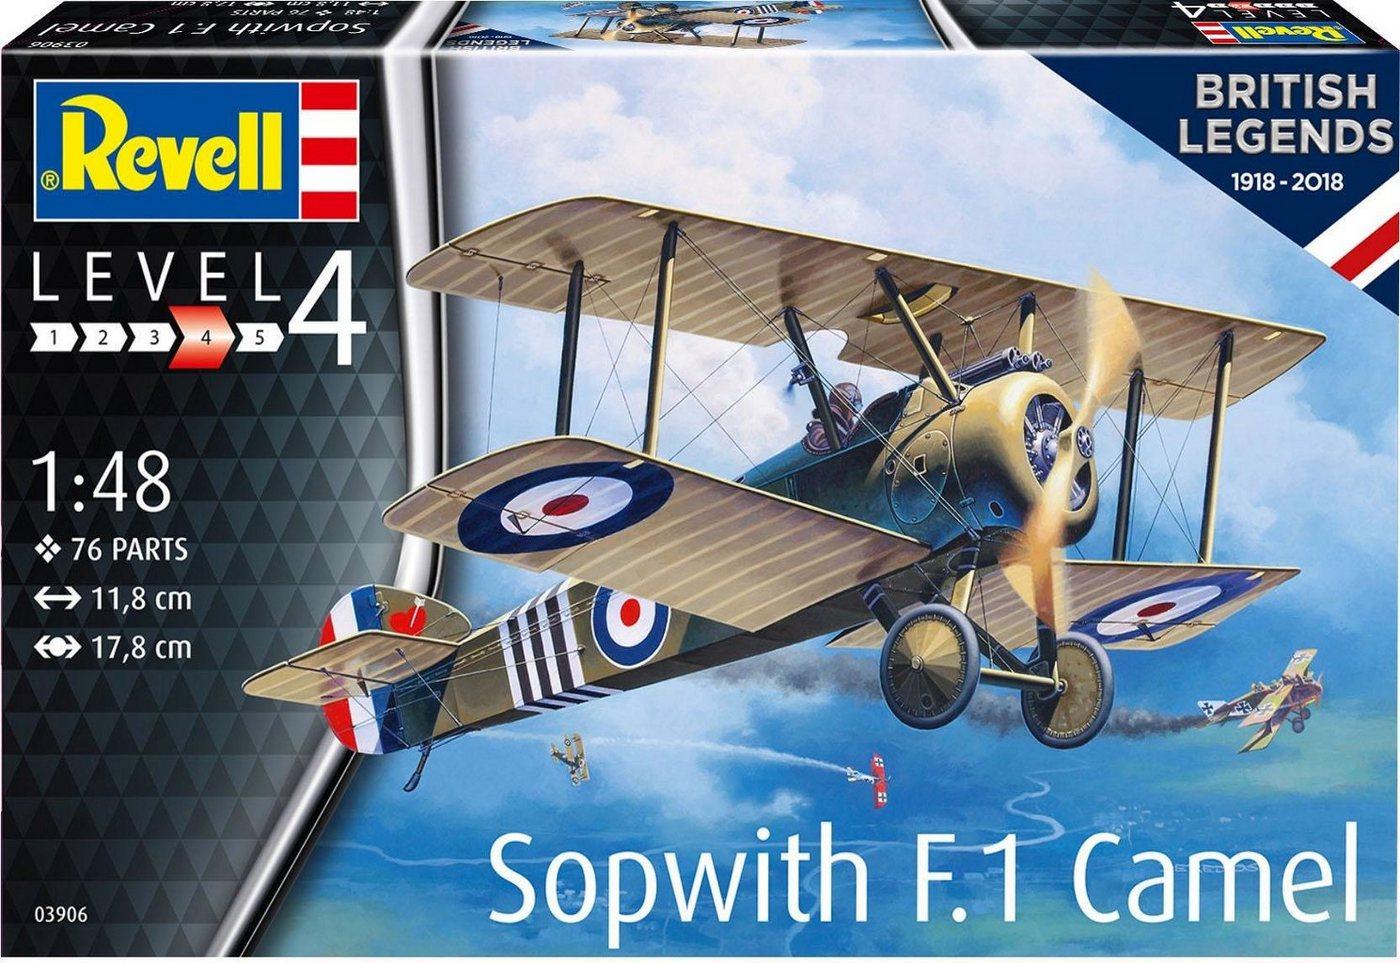 Revell Modellbausatz Flugzeug, Maßstab 1:48, »British Legends 1918-2018, Sopwith F.1 Camel«